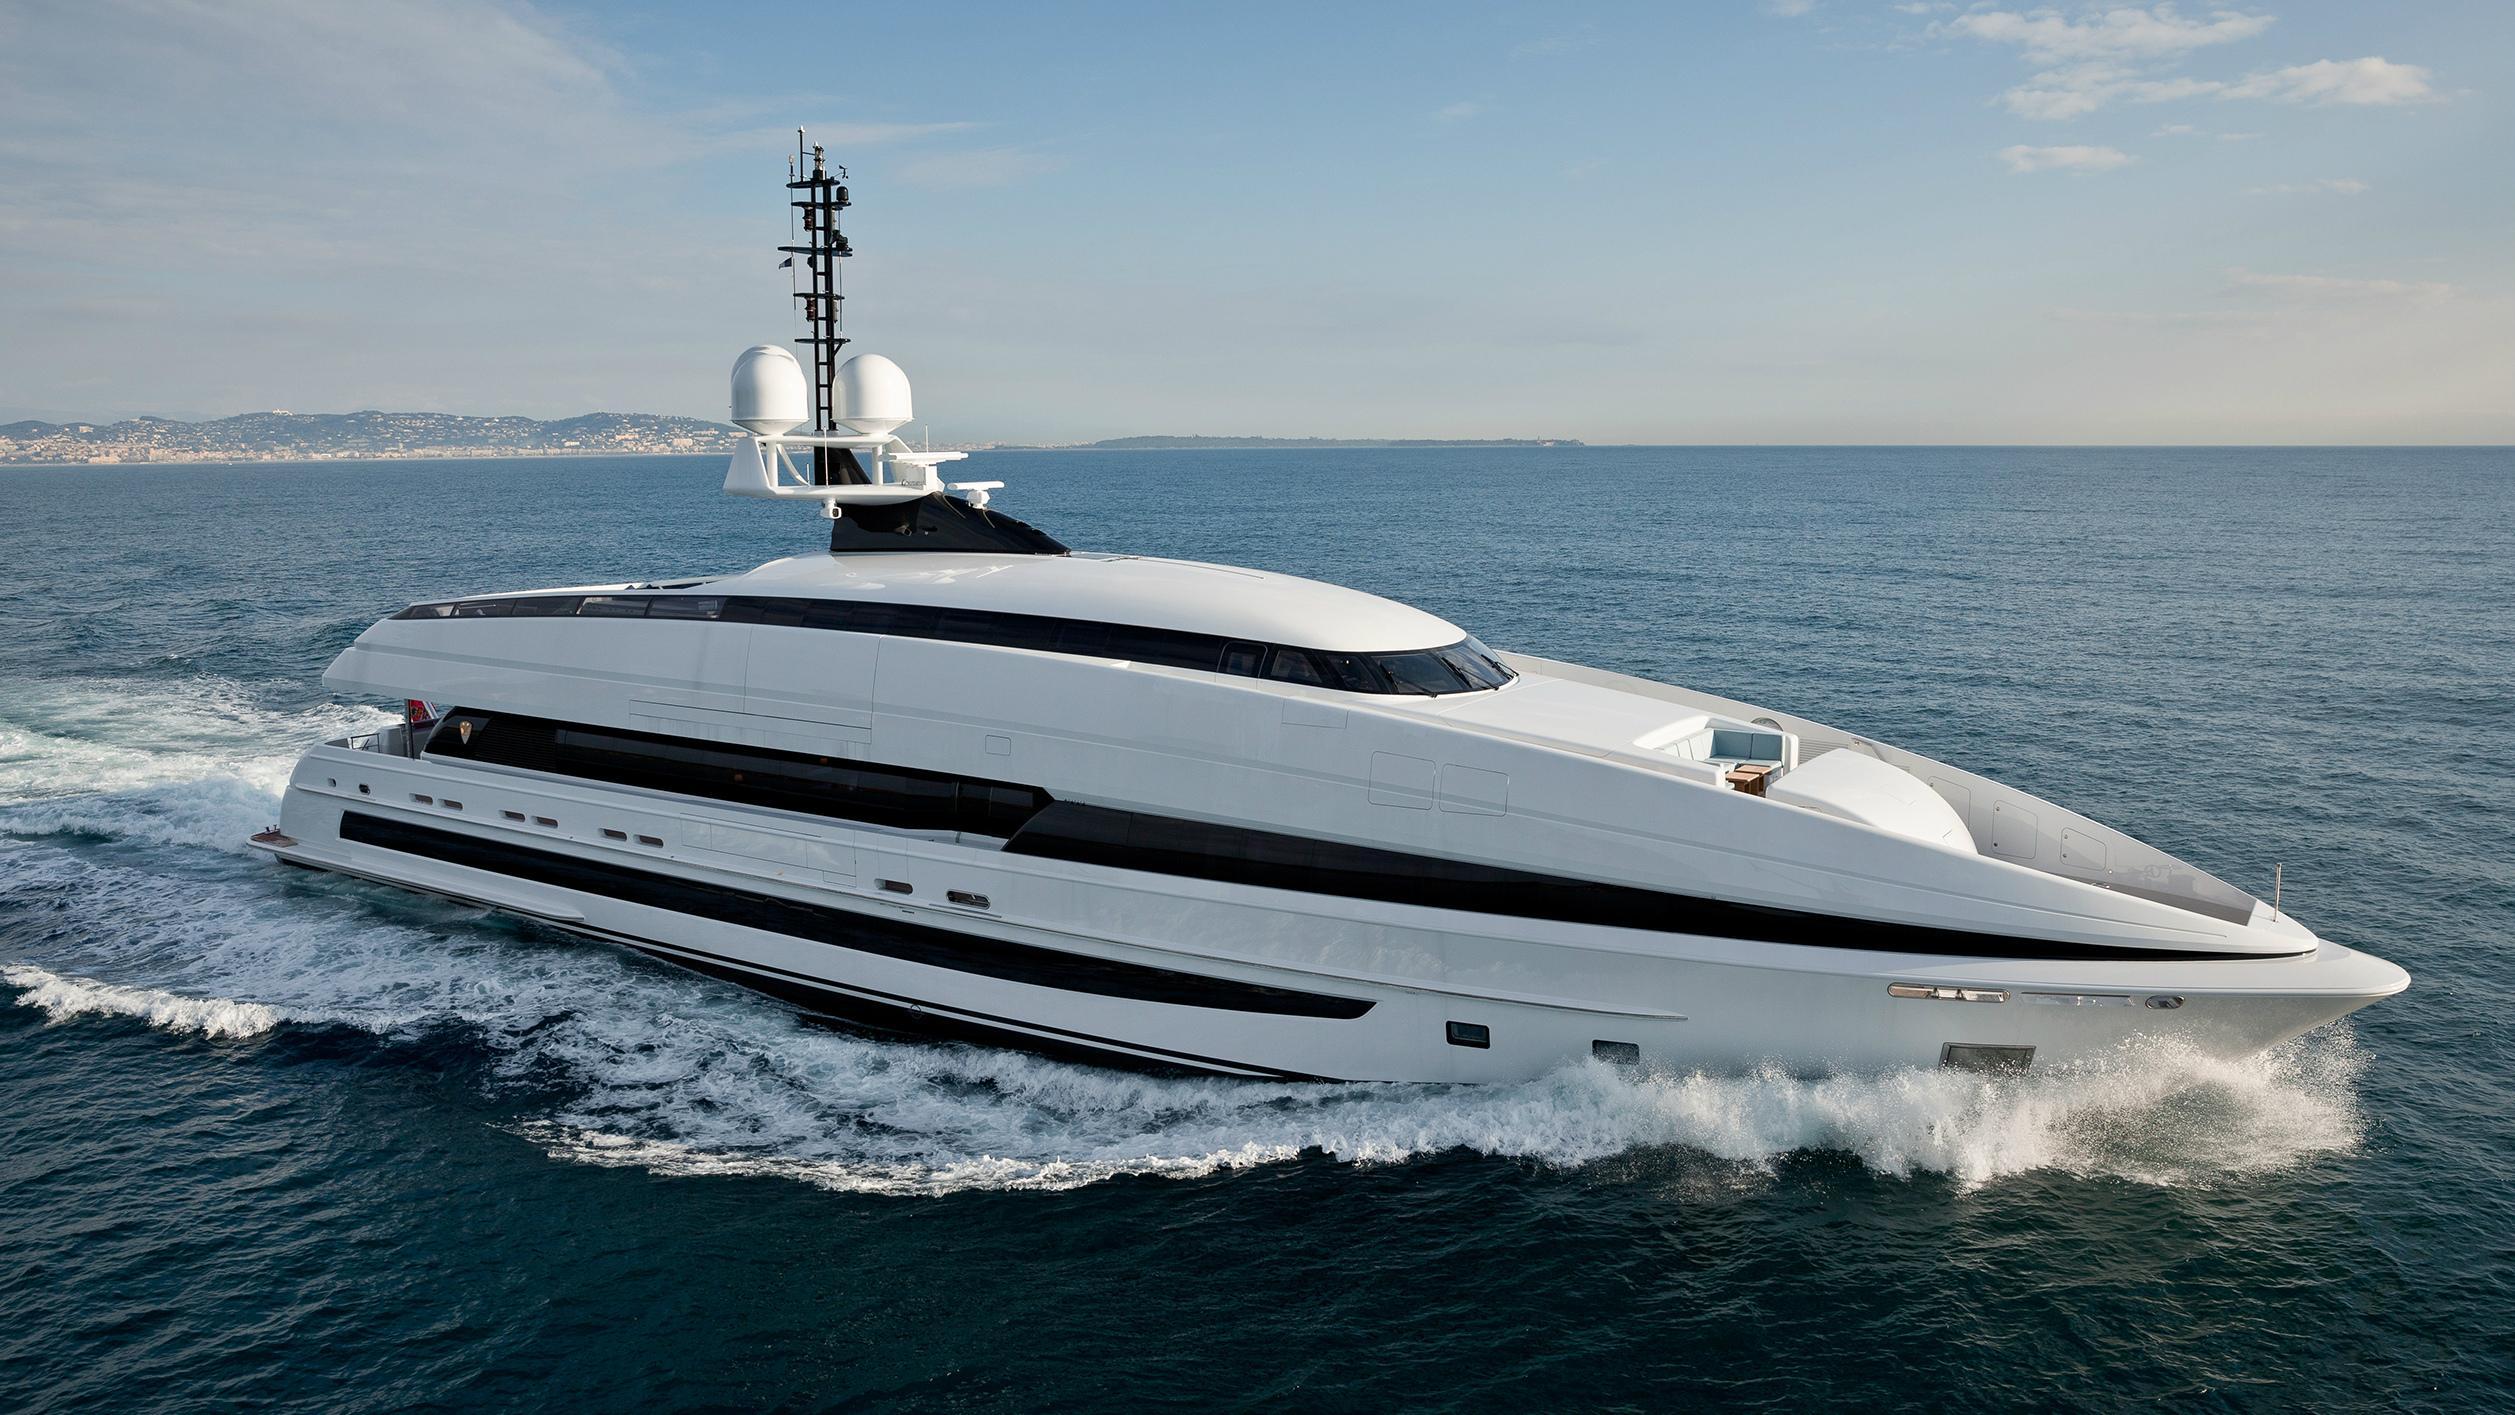 crazy-me-motor-yacht-heesen-2013-50m-cruising